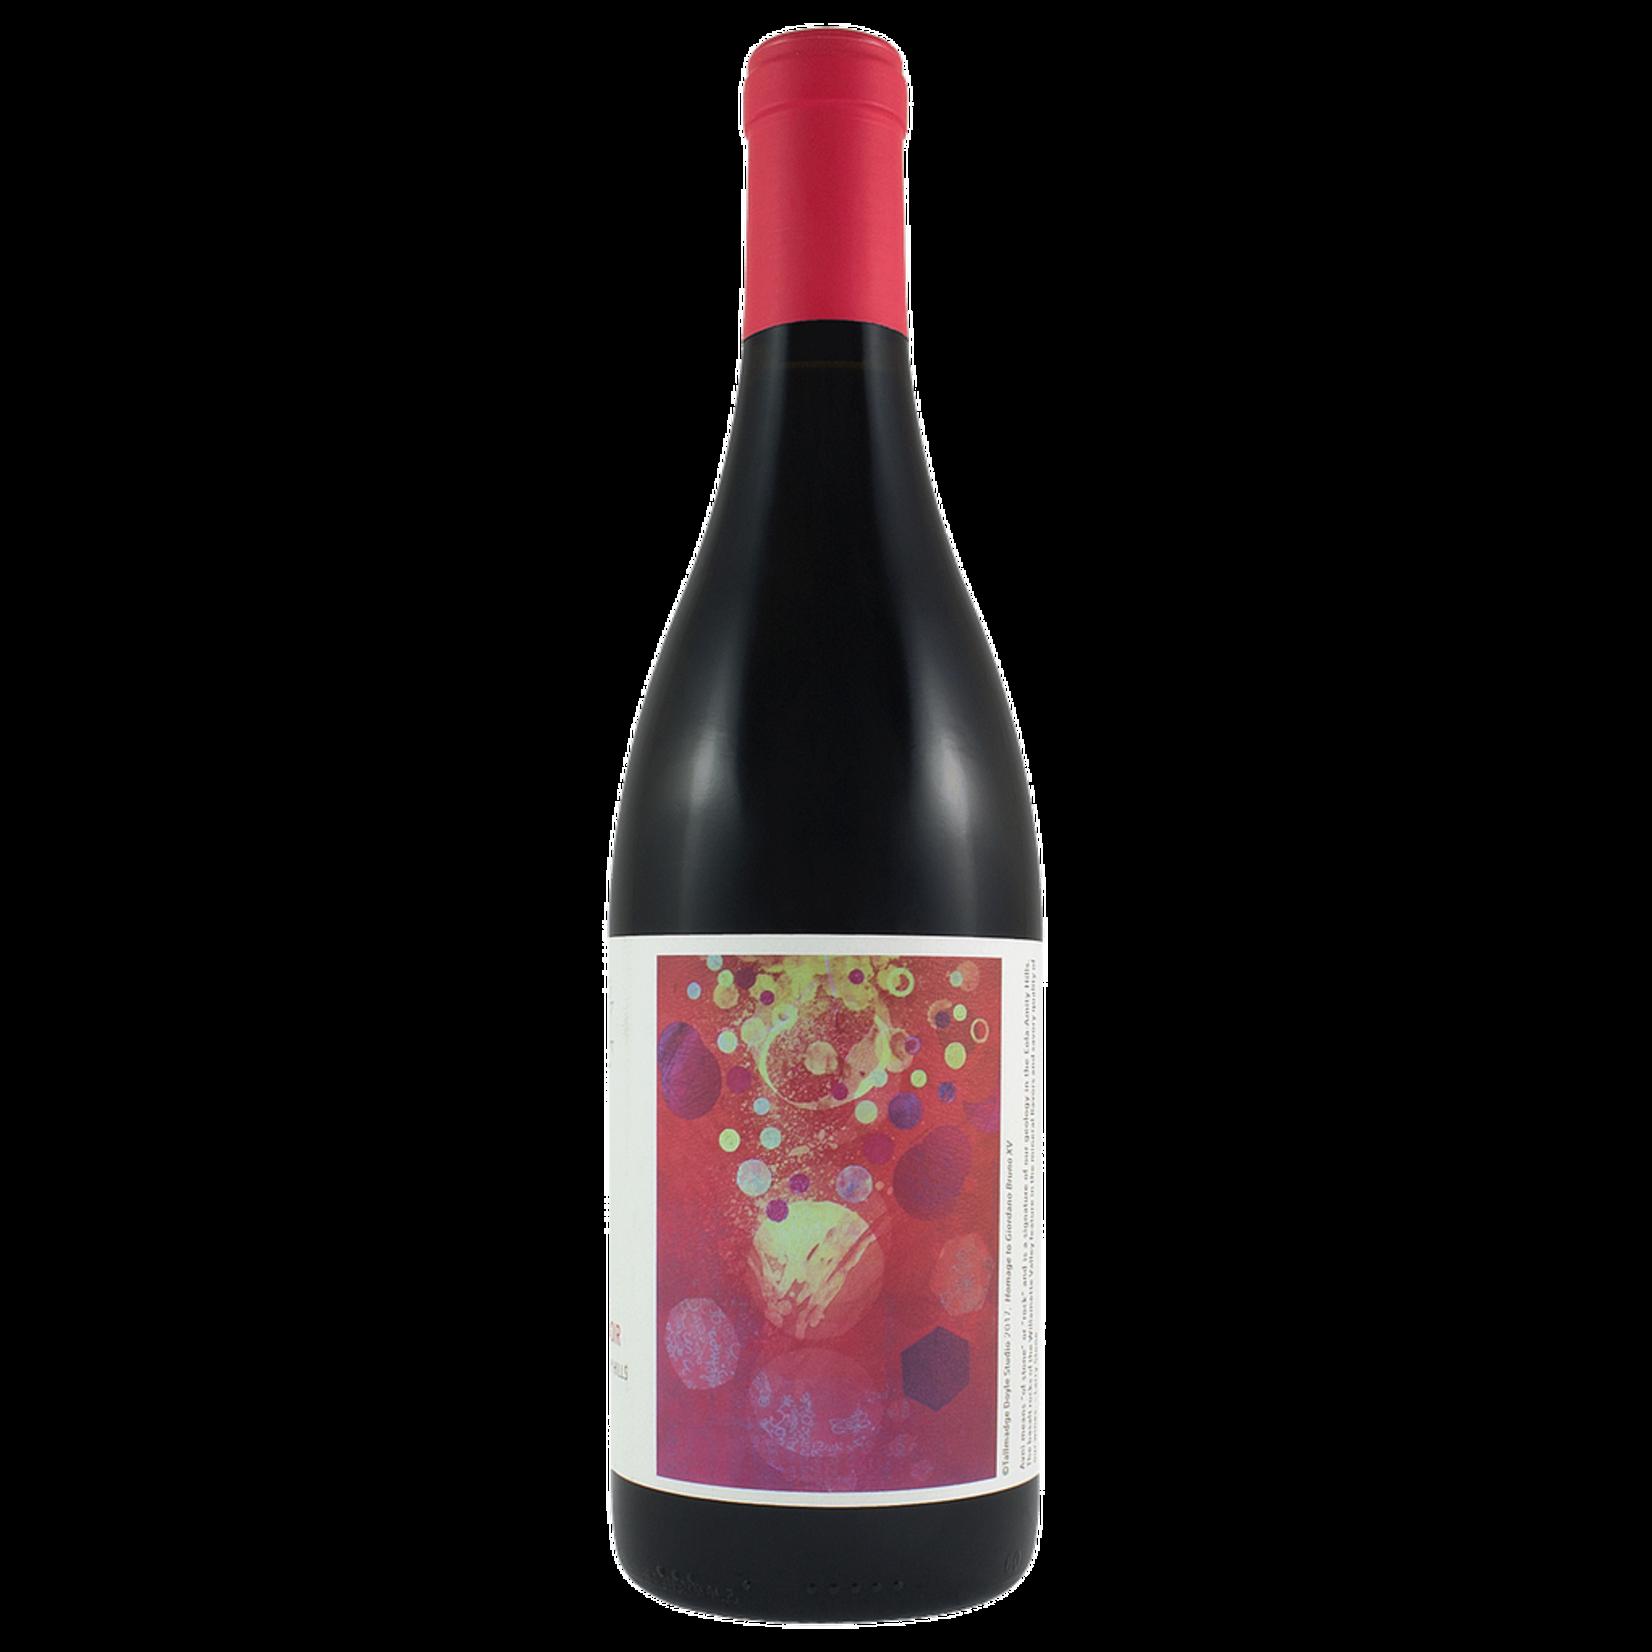 Lingua Franca Avni Pinot Noir 2017